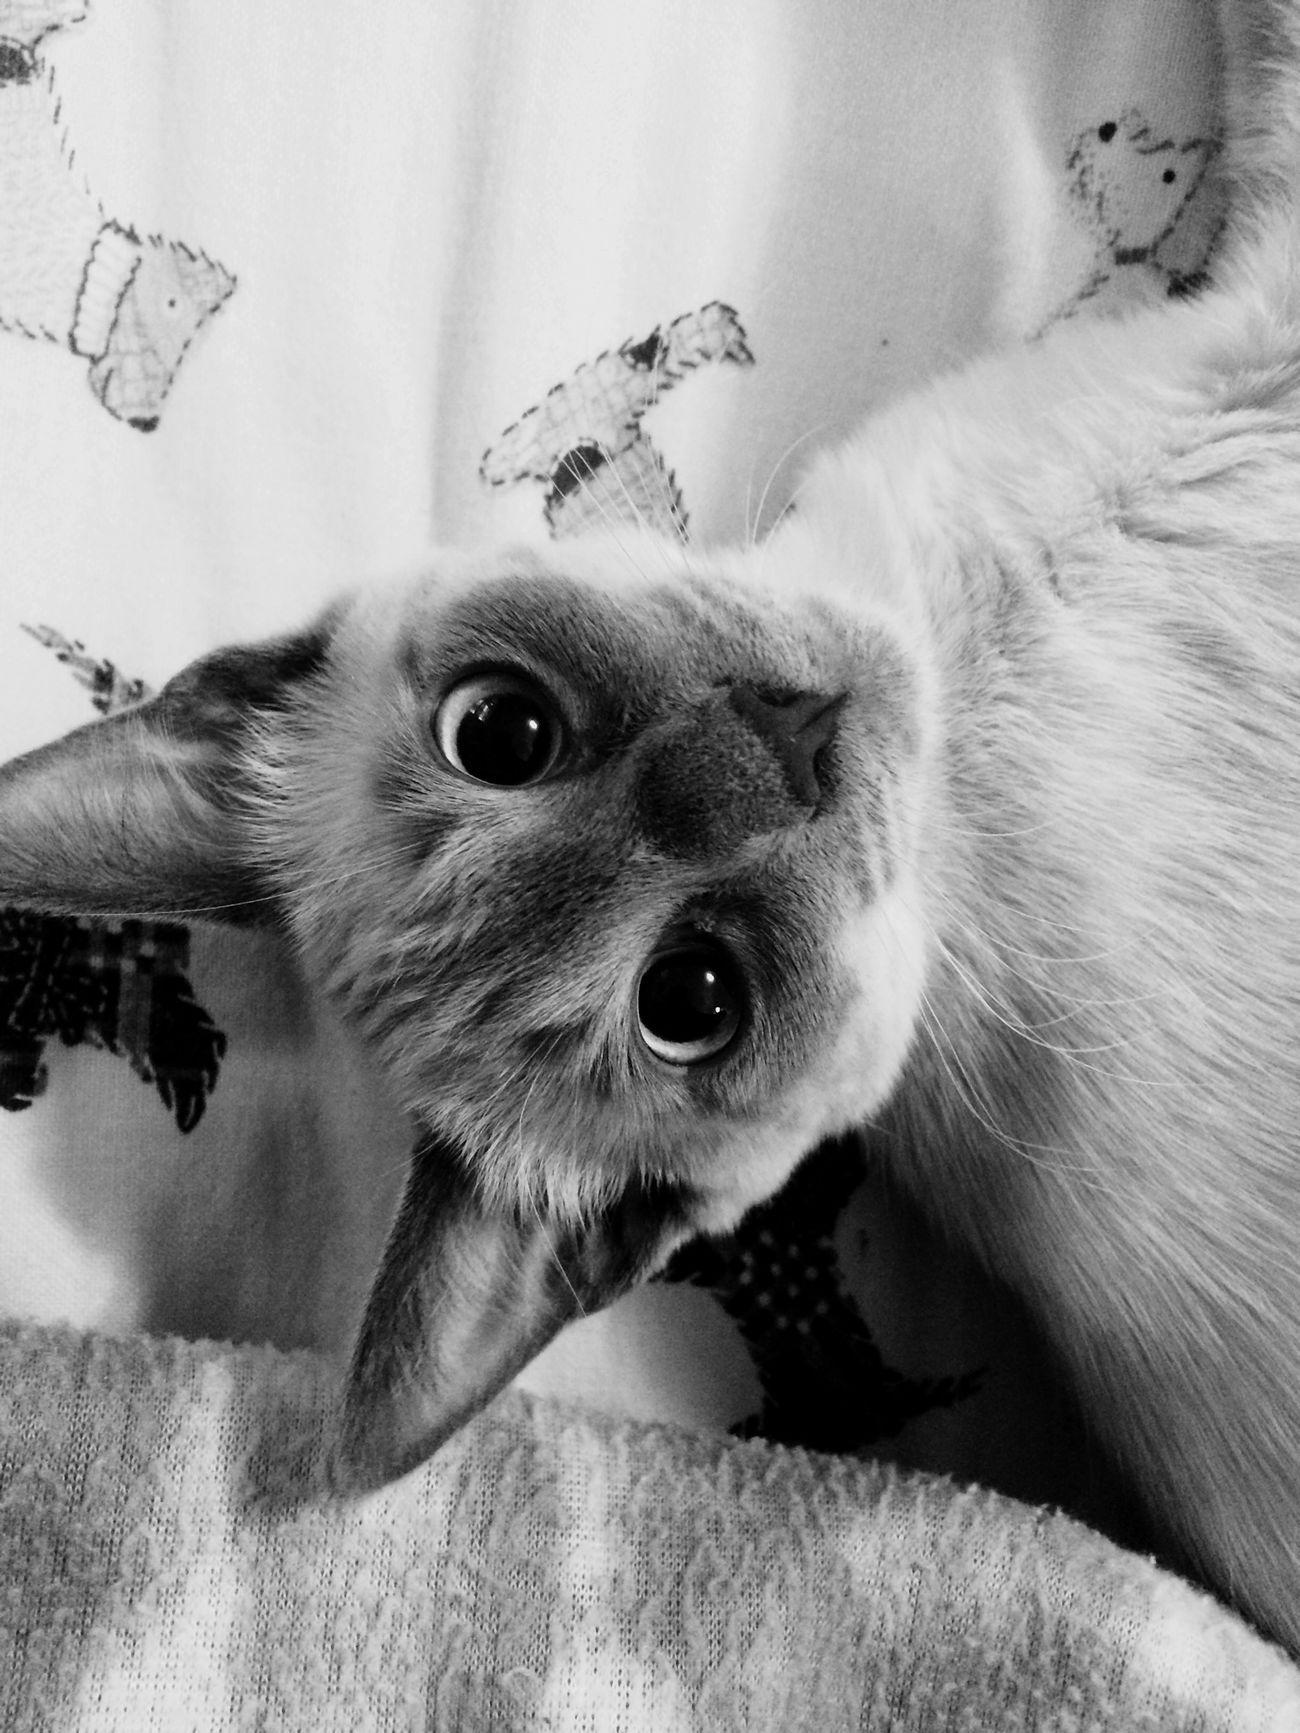 Meow Cats Catstagram Catsagram Emmie Kittens